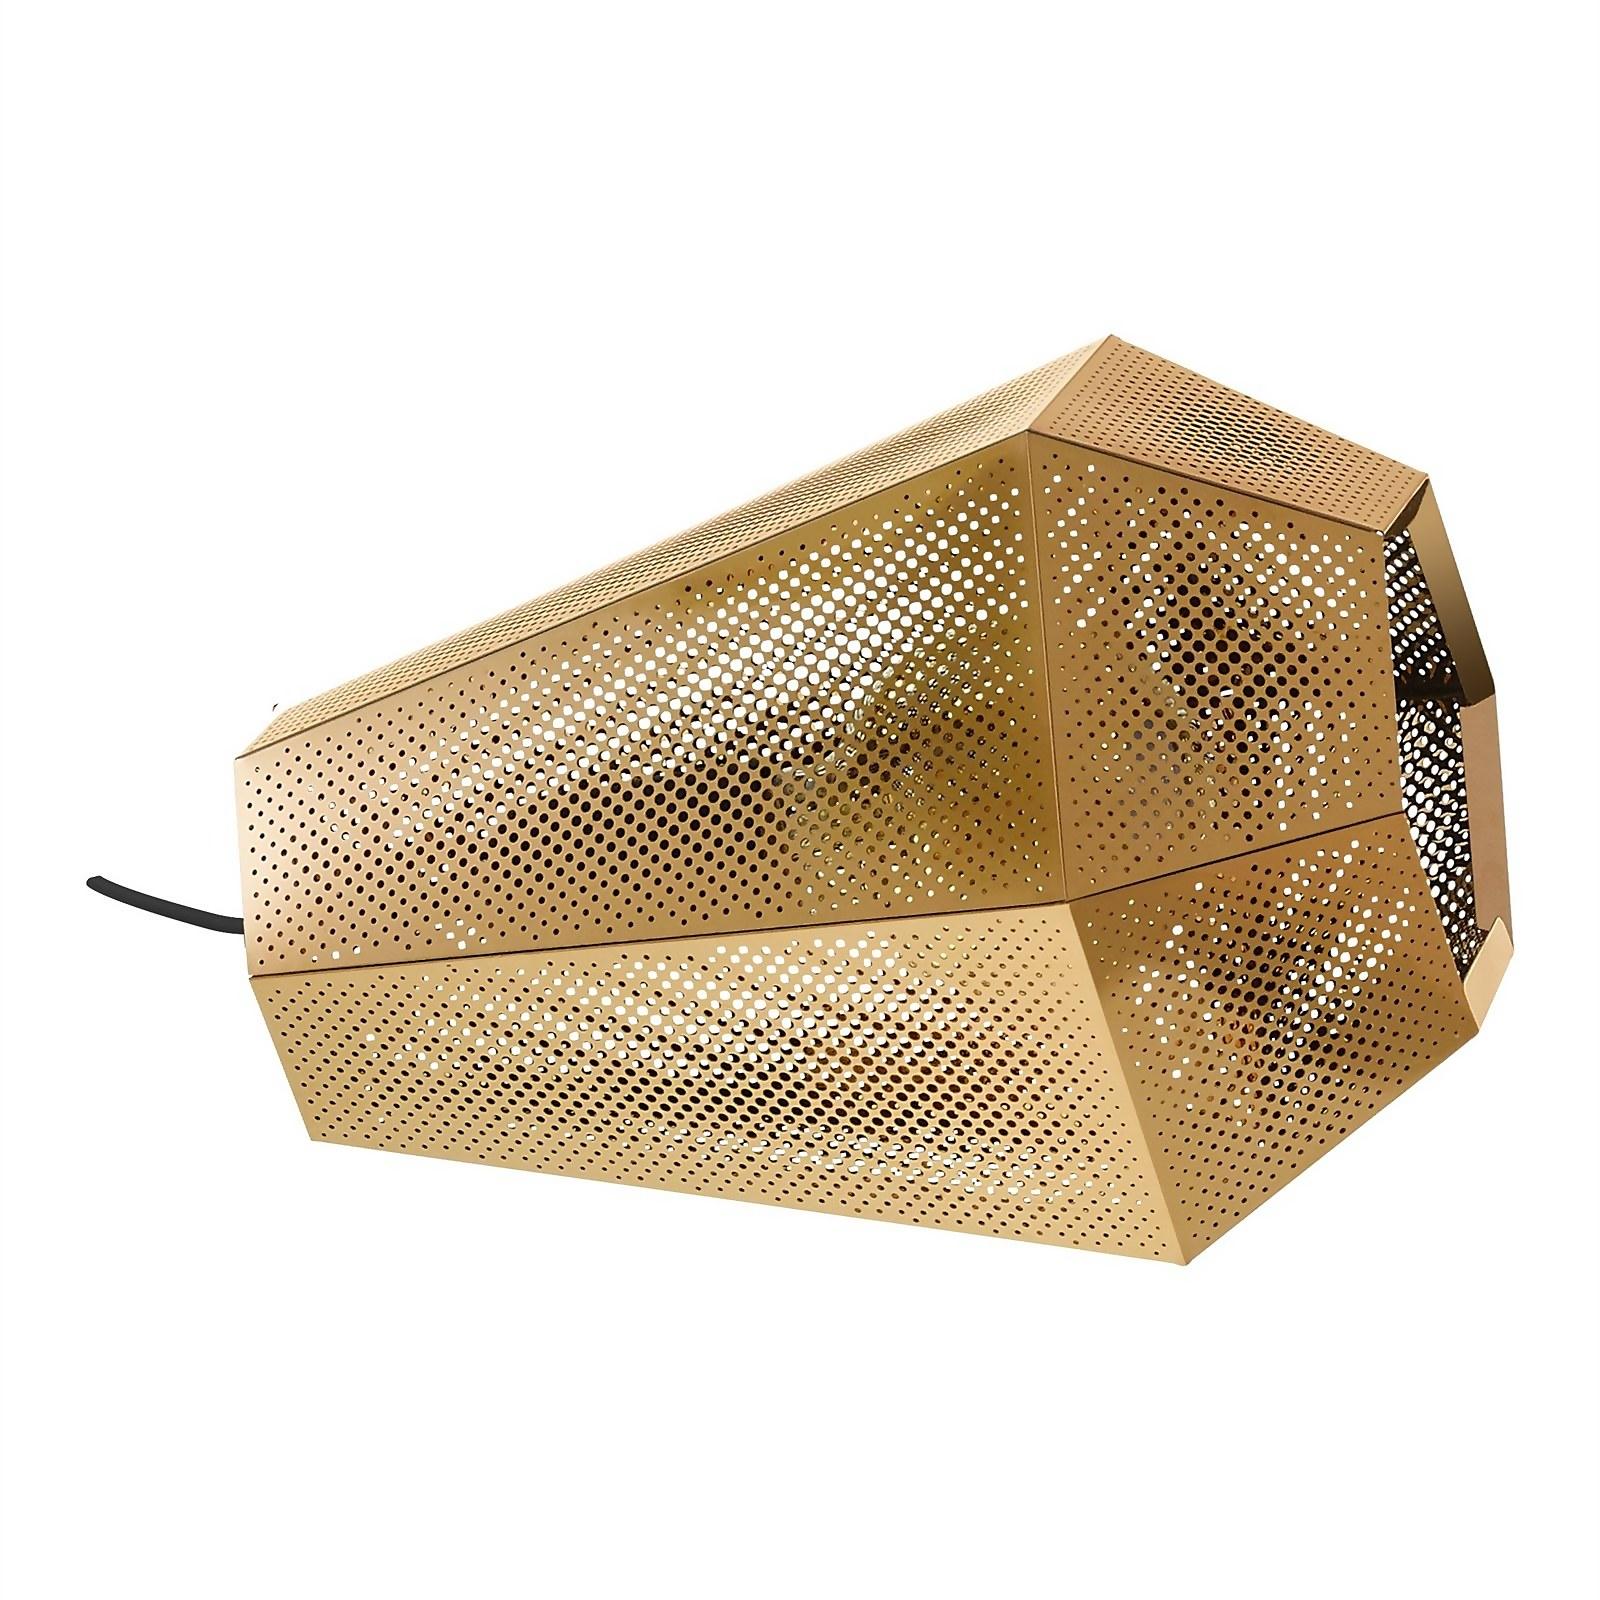 Eglo Chiavica 1 Brass Table Lamp